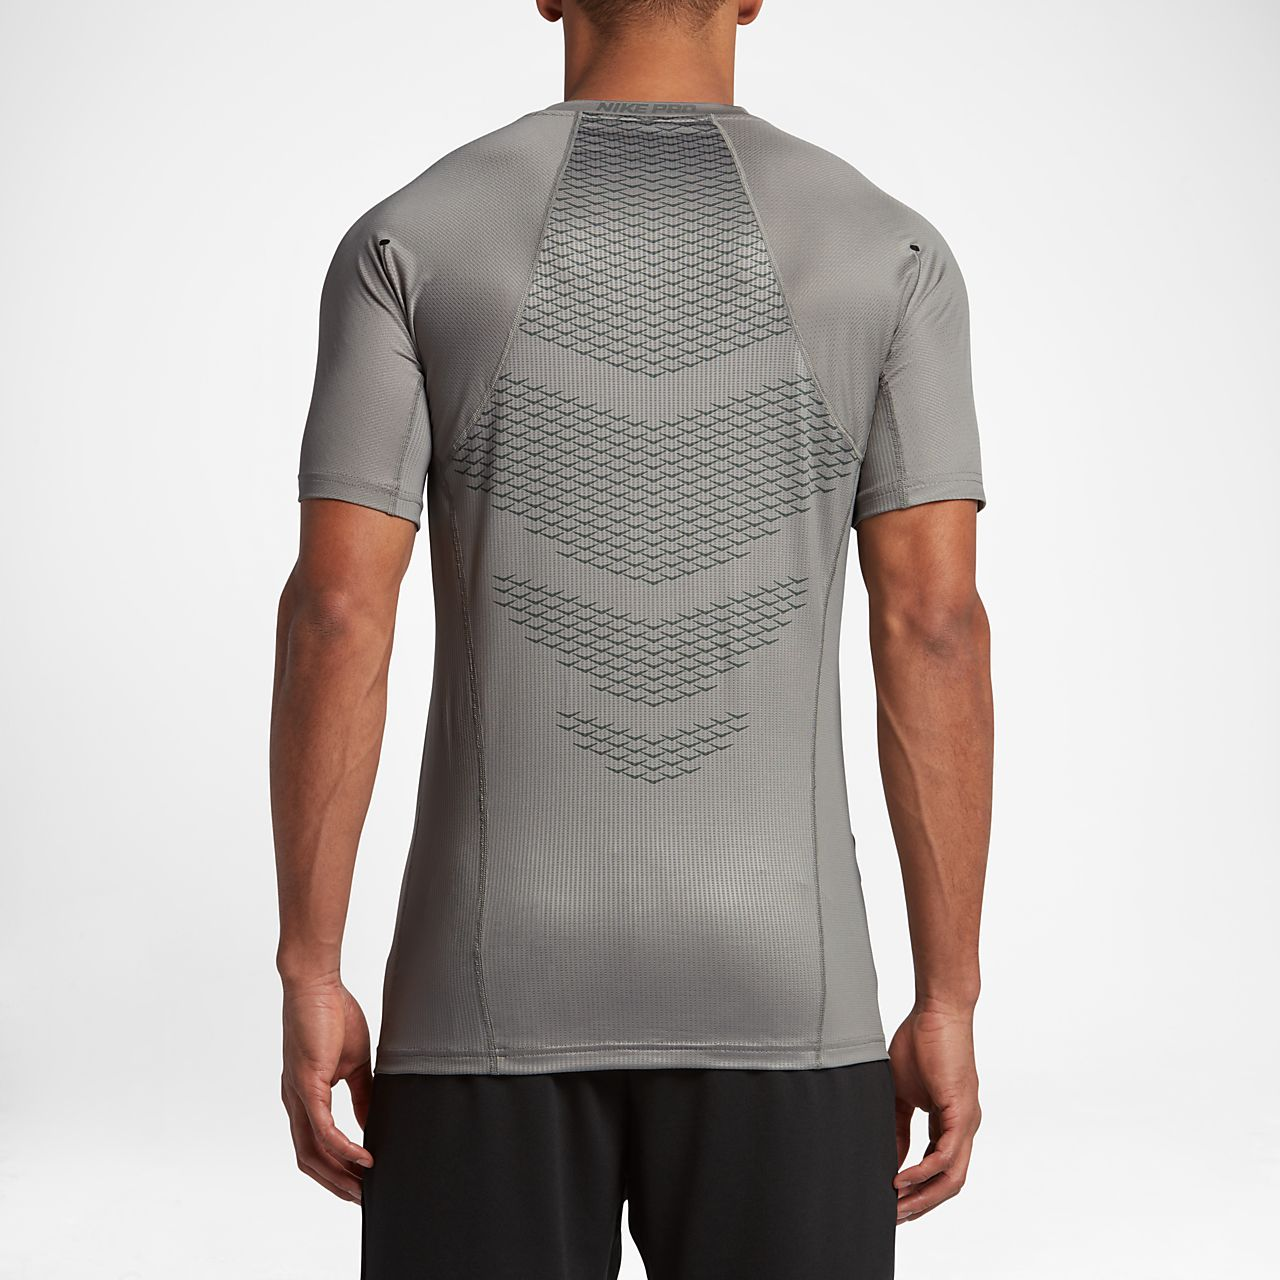 ... Nike Pro HyperCool Men's Short-Sleeve Top